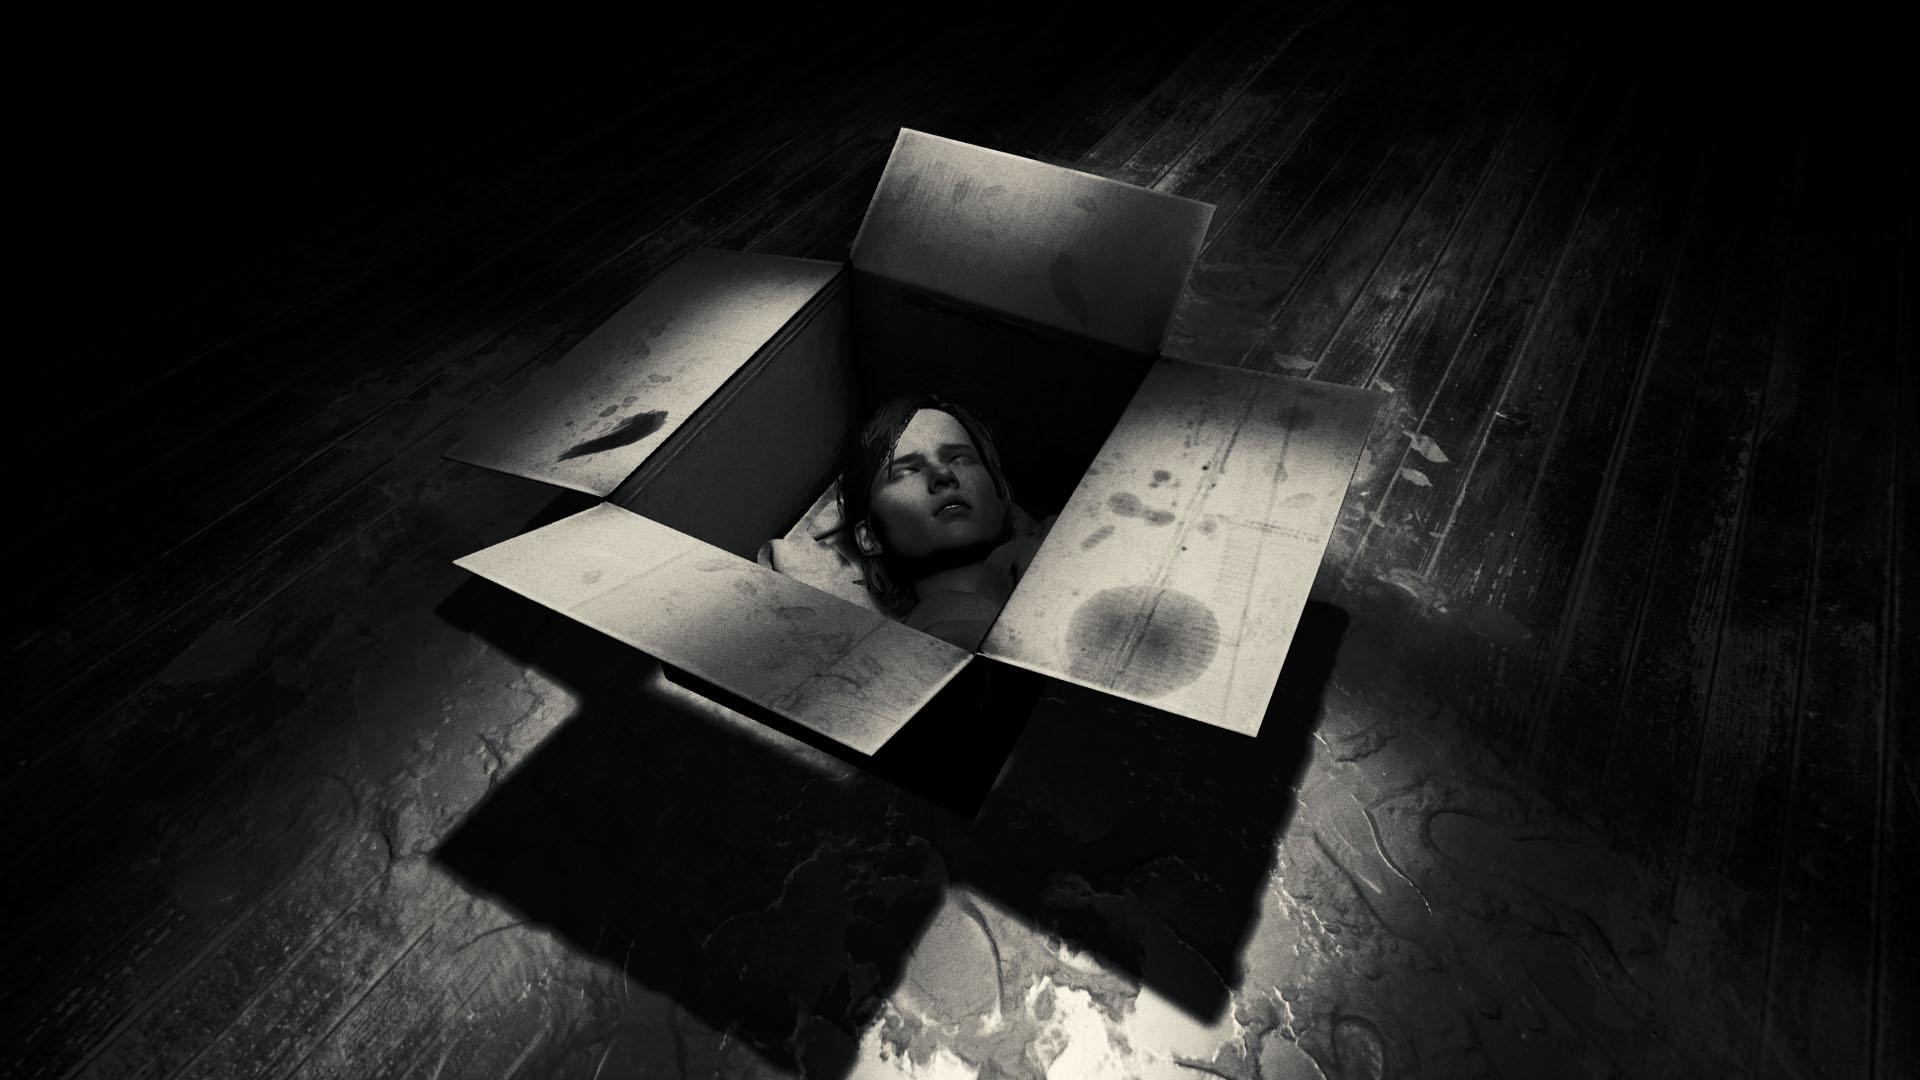 Layers of Fear 2 — Se7en Homage